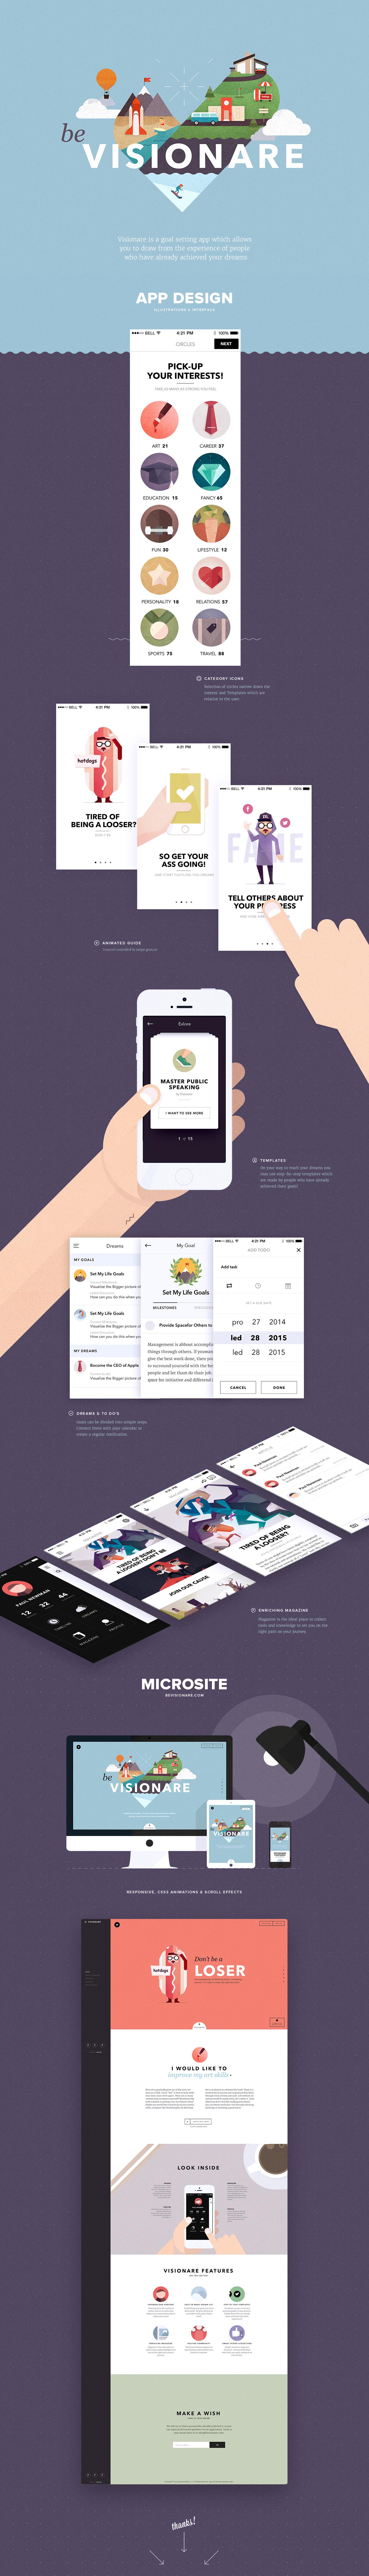 darkfejzr ios mobile app icons flat polygon iphone Web microsite